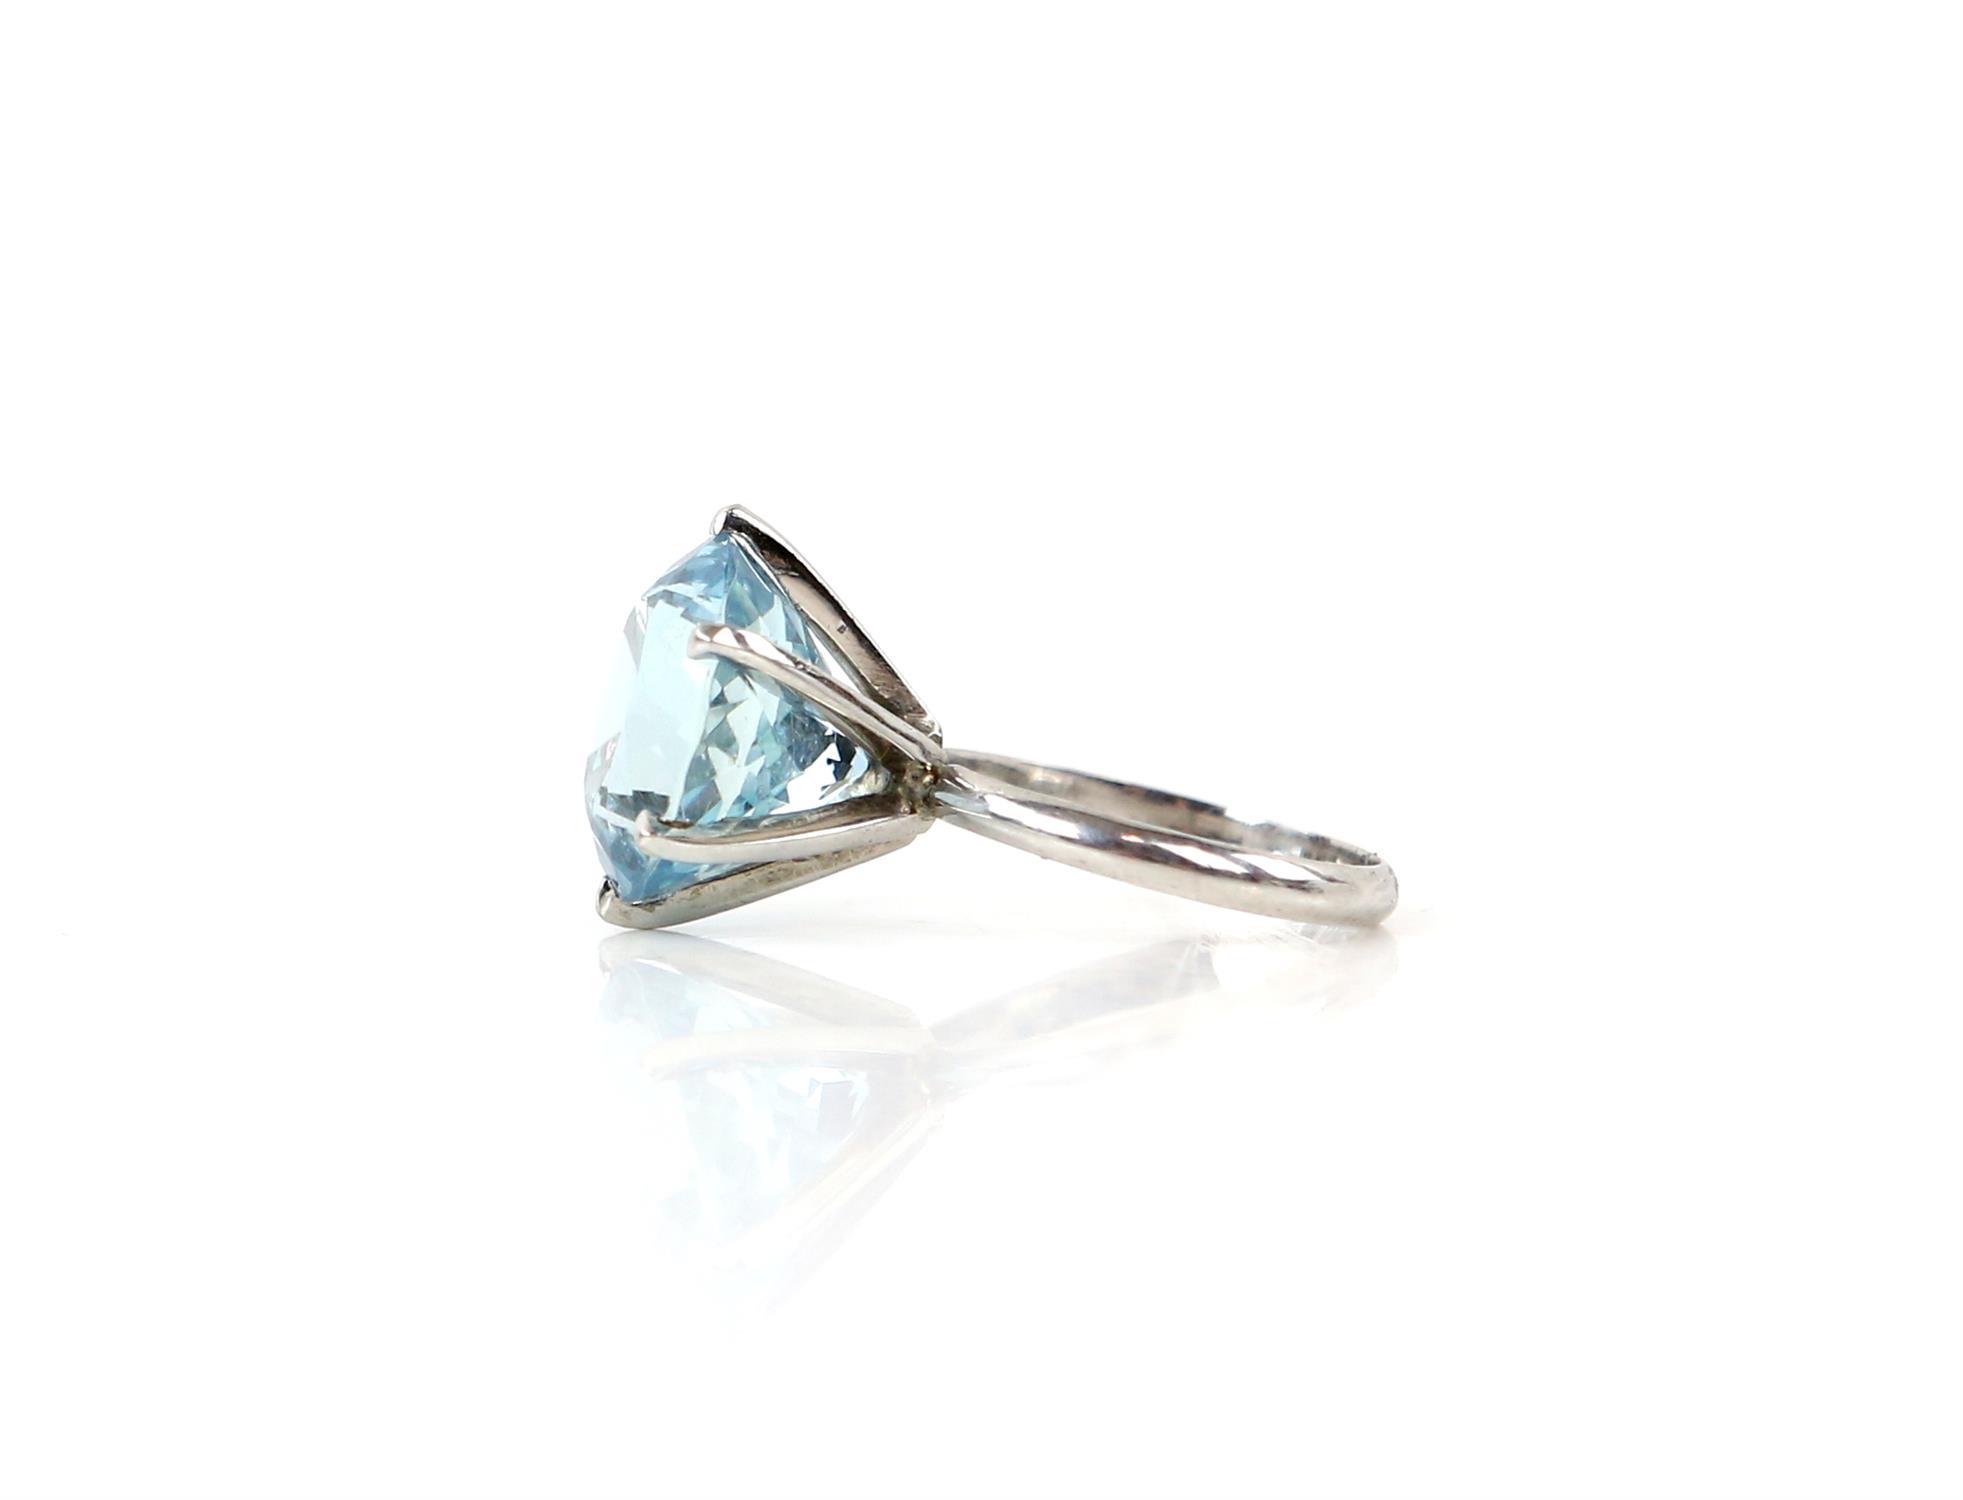 Aquamarine ring, round cut aquamarine, estimated weight 8.80 carats, mount testing as 18 ct, - Image 6 of 9